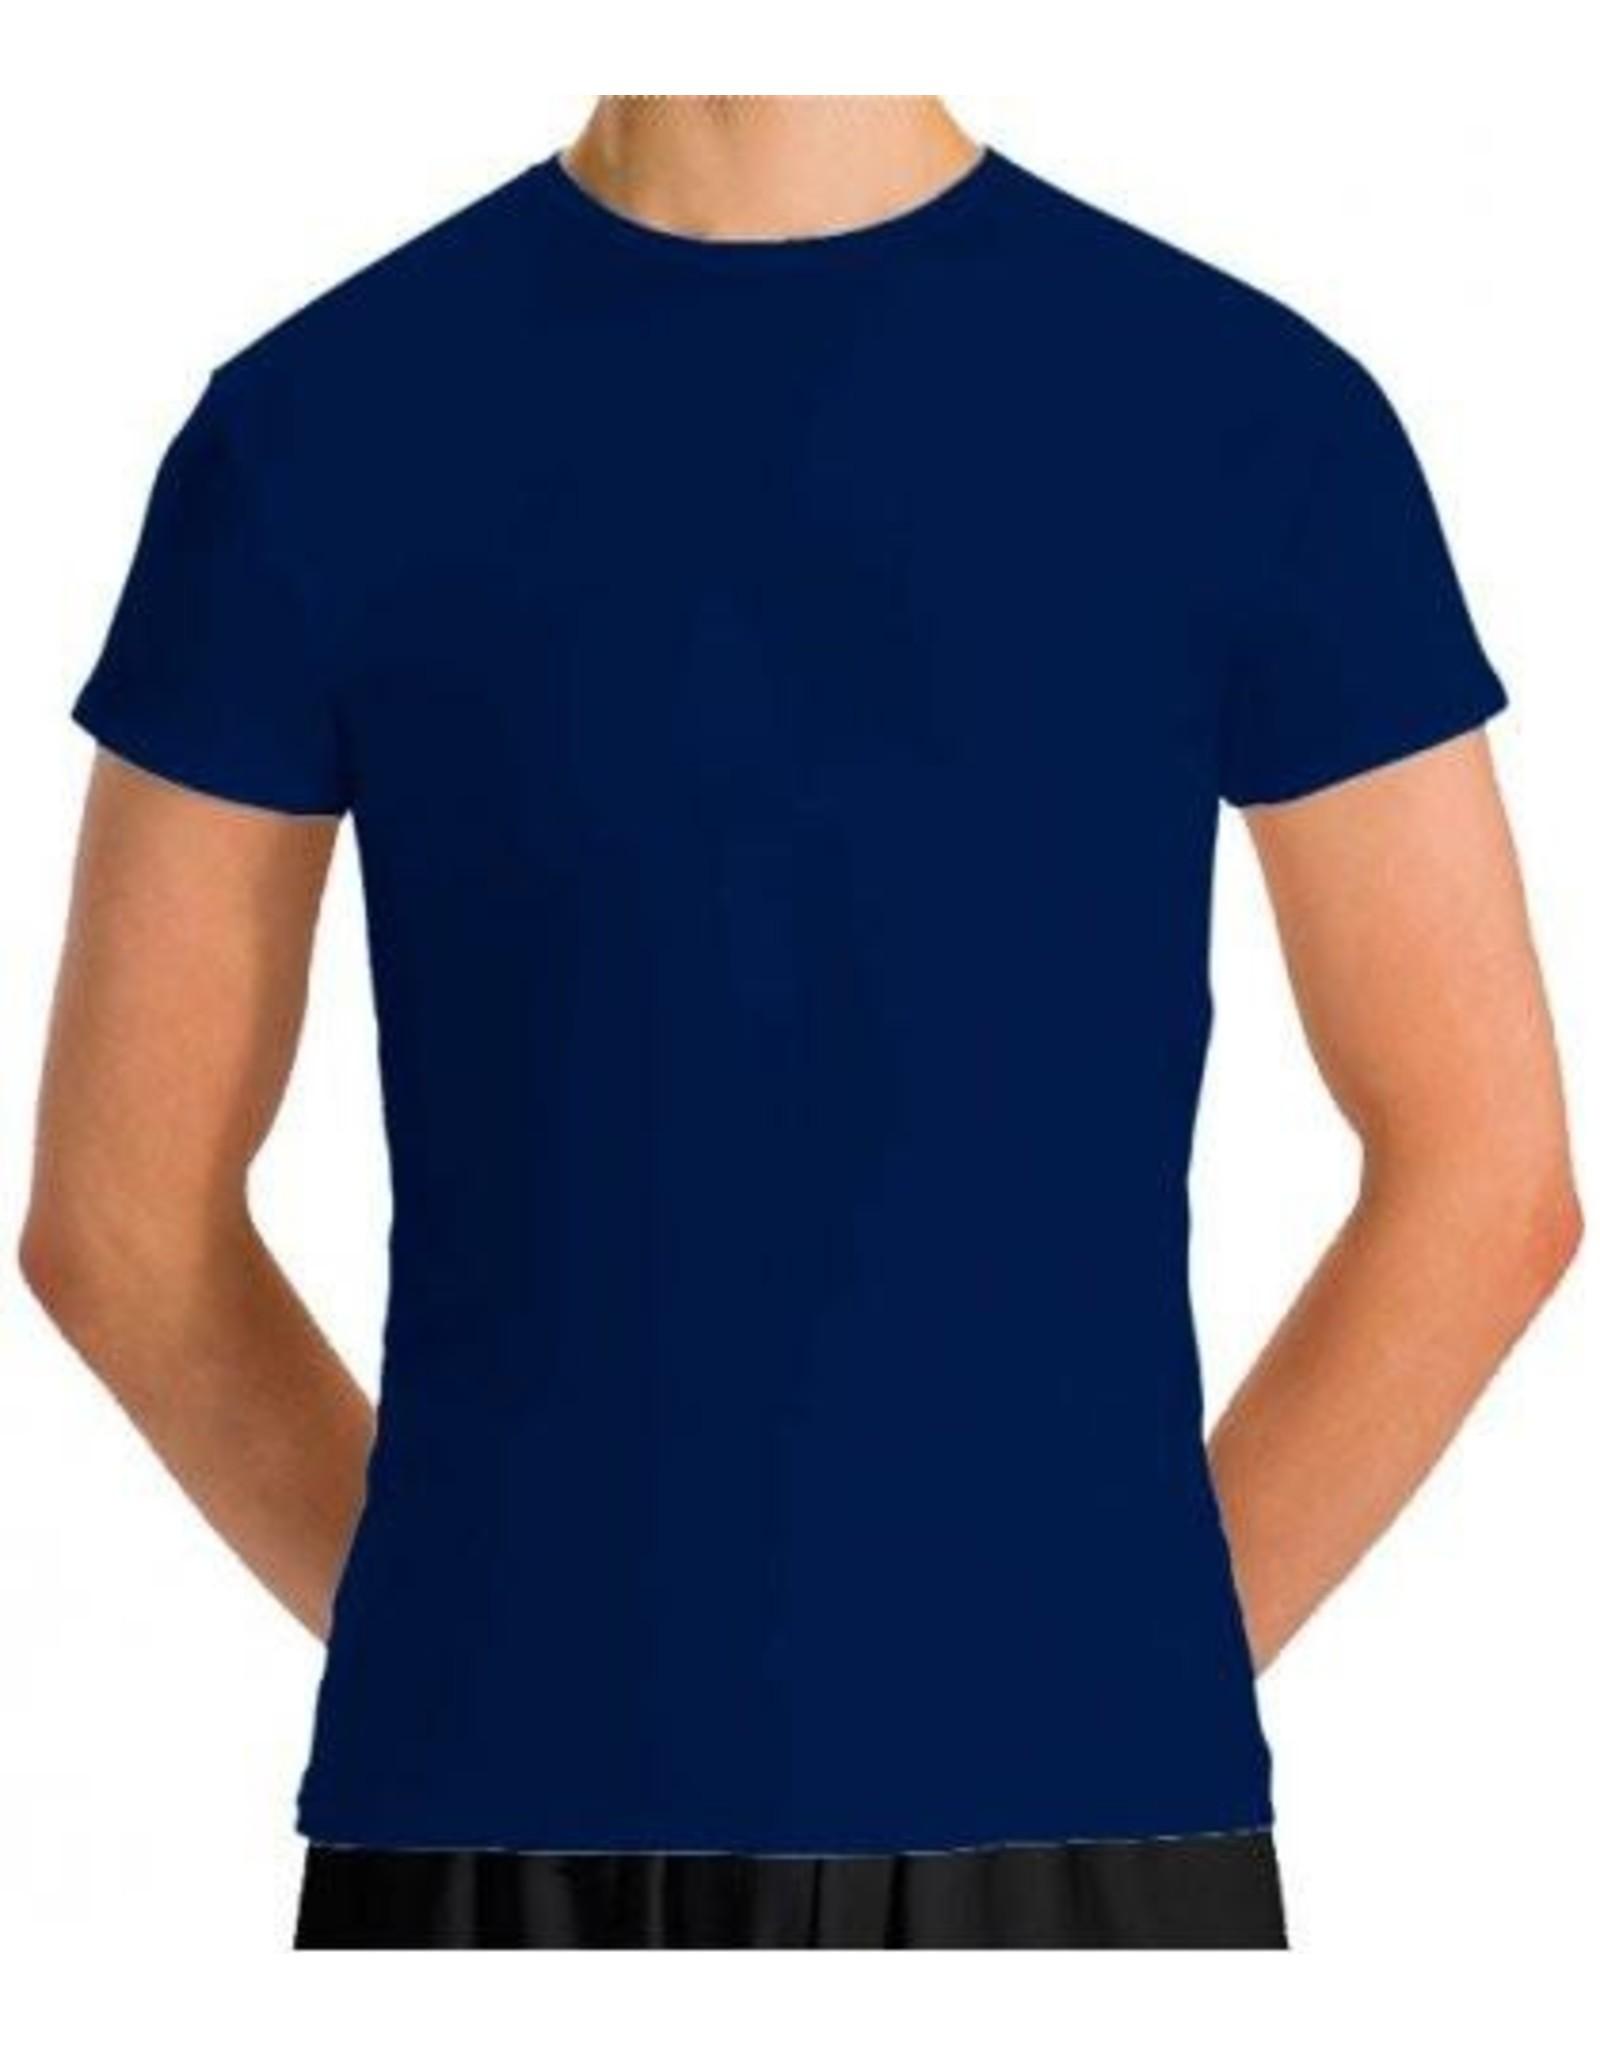 Motionwear Men's Cap Sleeve Fitted Top (MM7207)